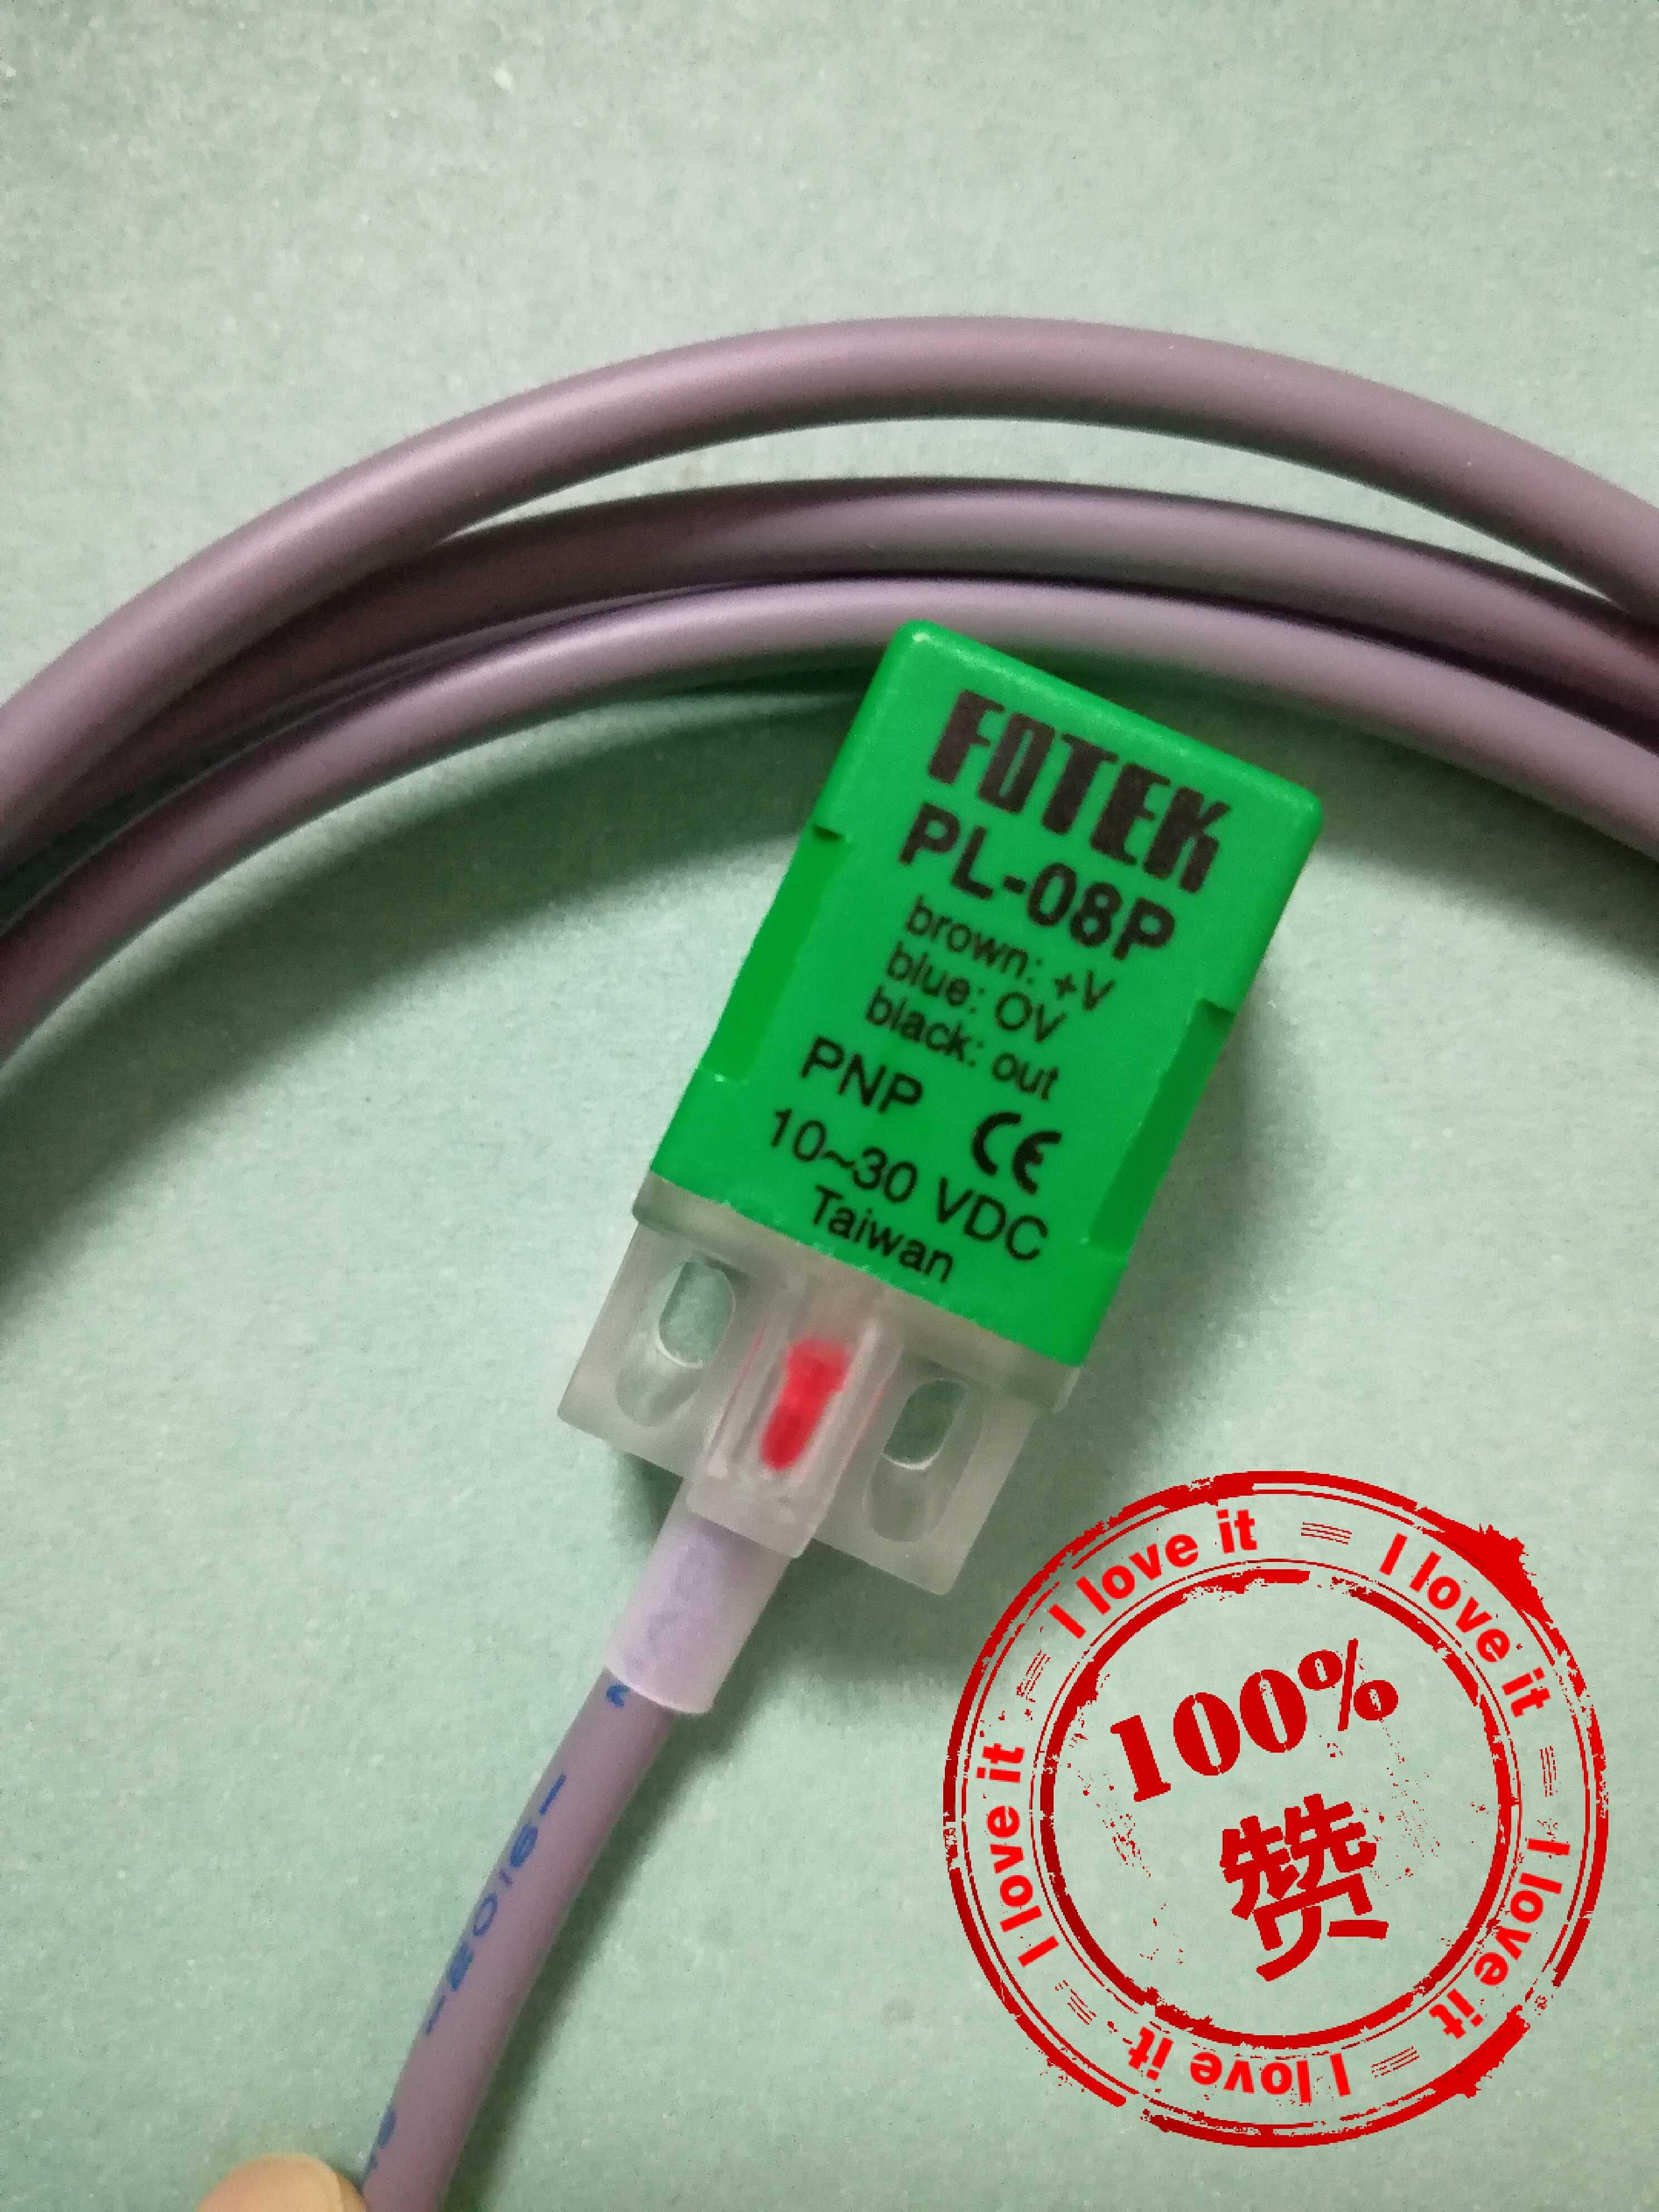 Square Proximity Switch PL-08P New Original